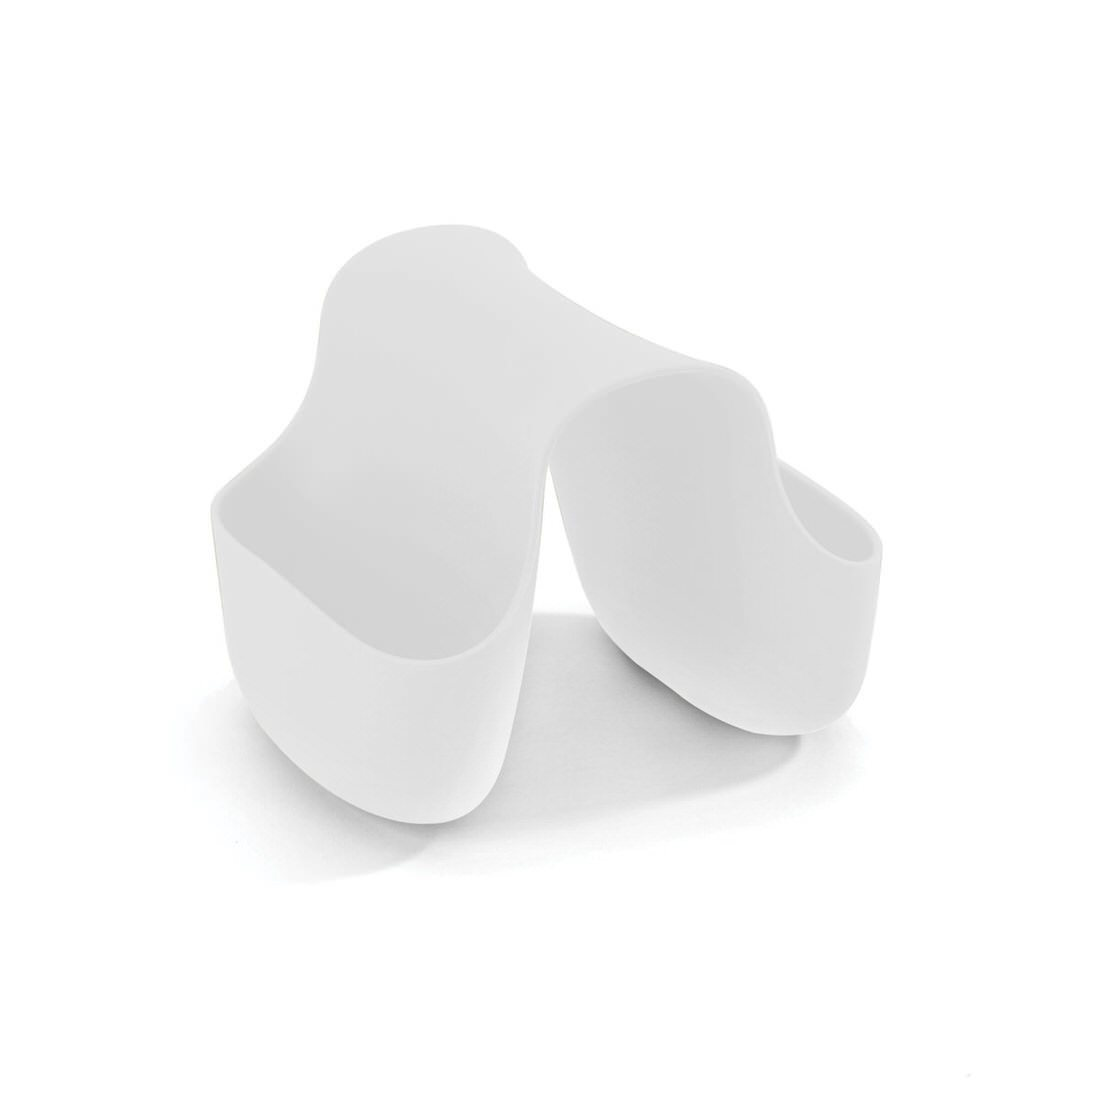 Umbra Saddle Sink Caddy Bright White